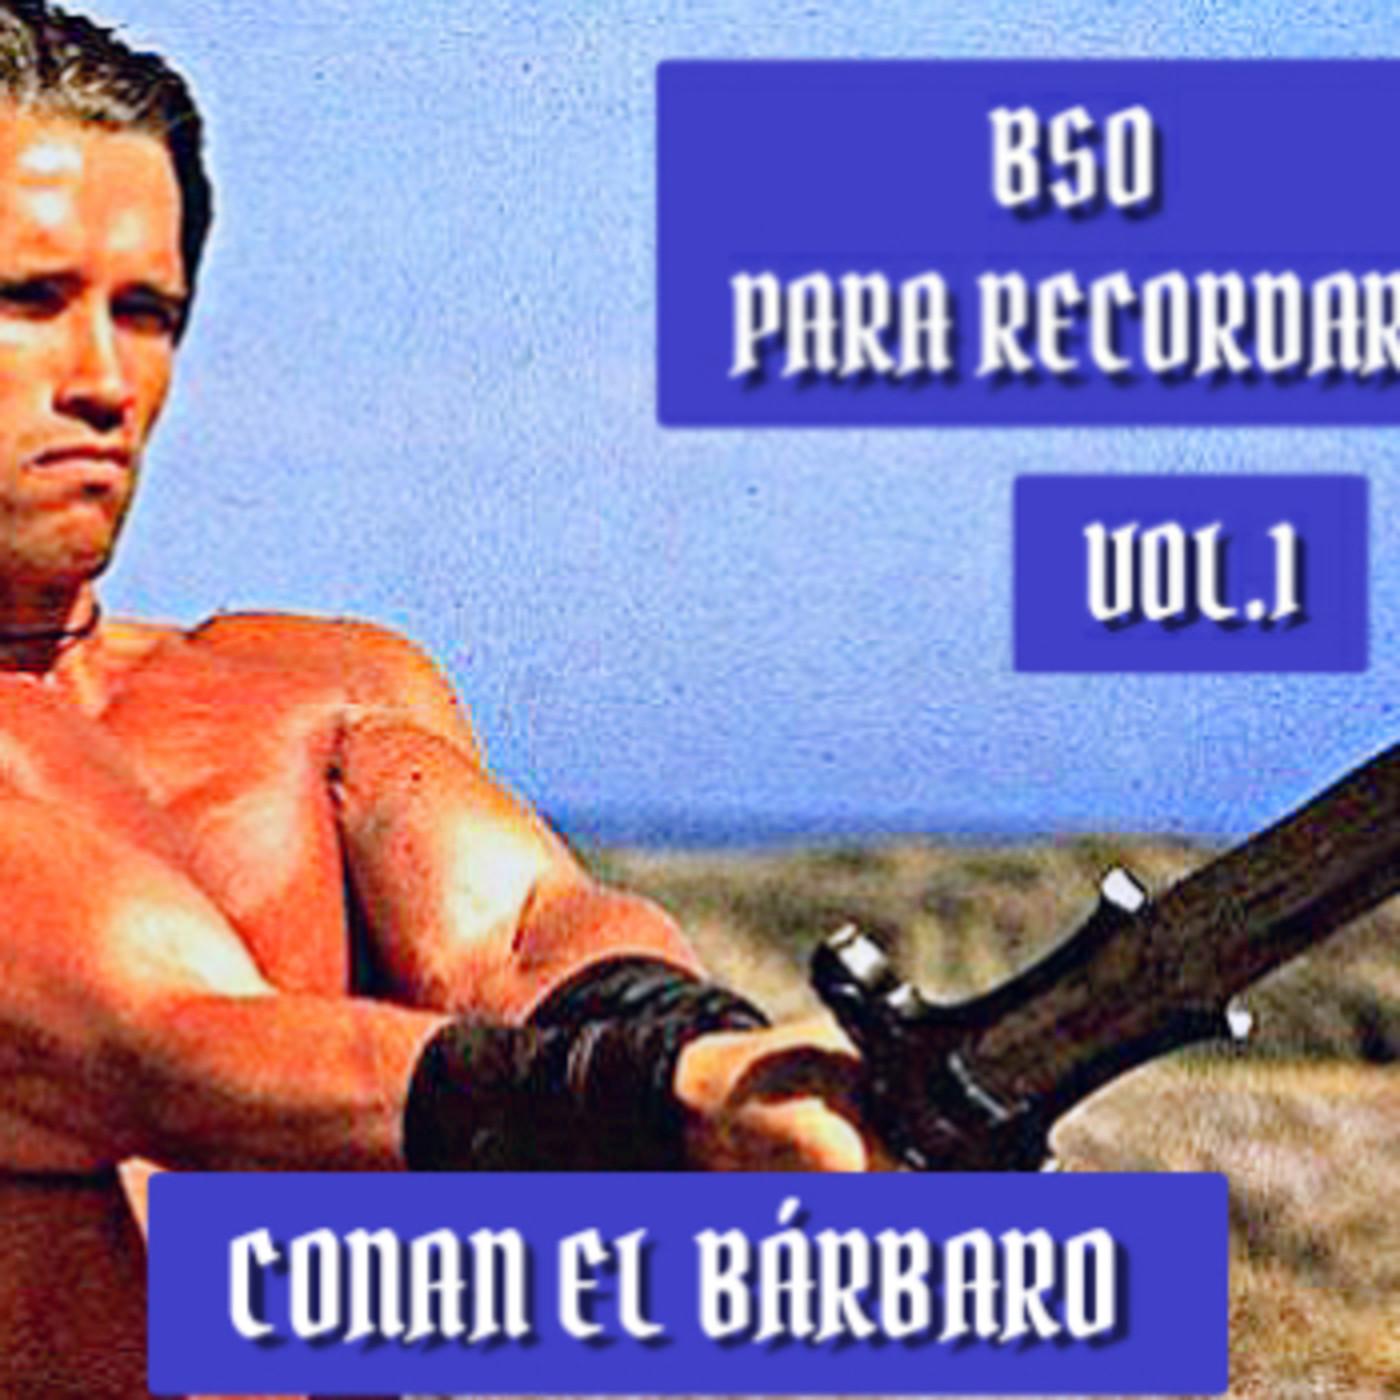 Bso para recordar vol.1 conan the barbarian